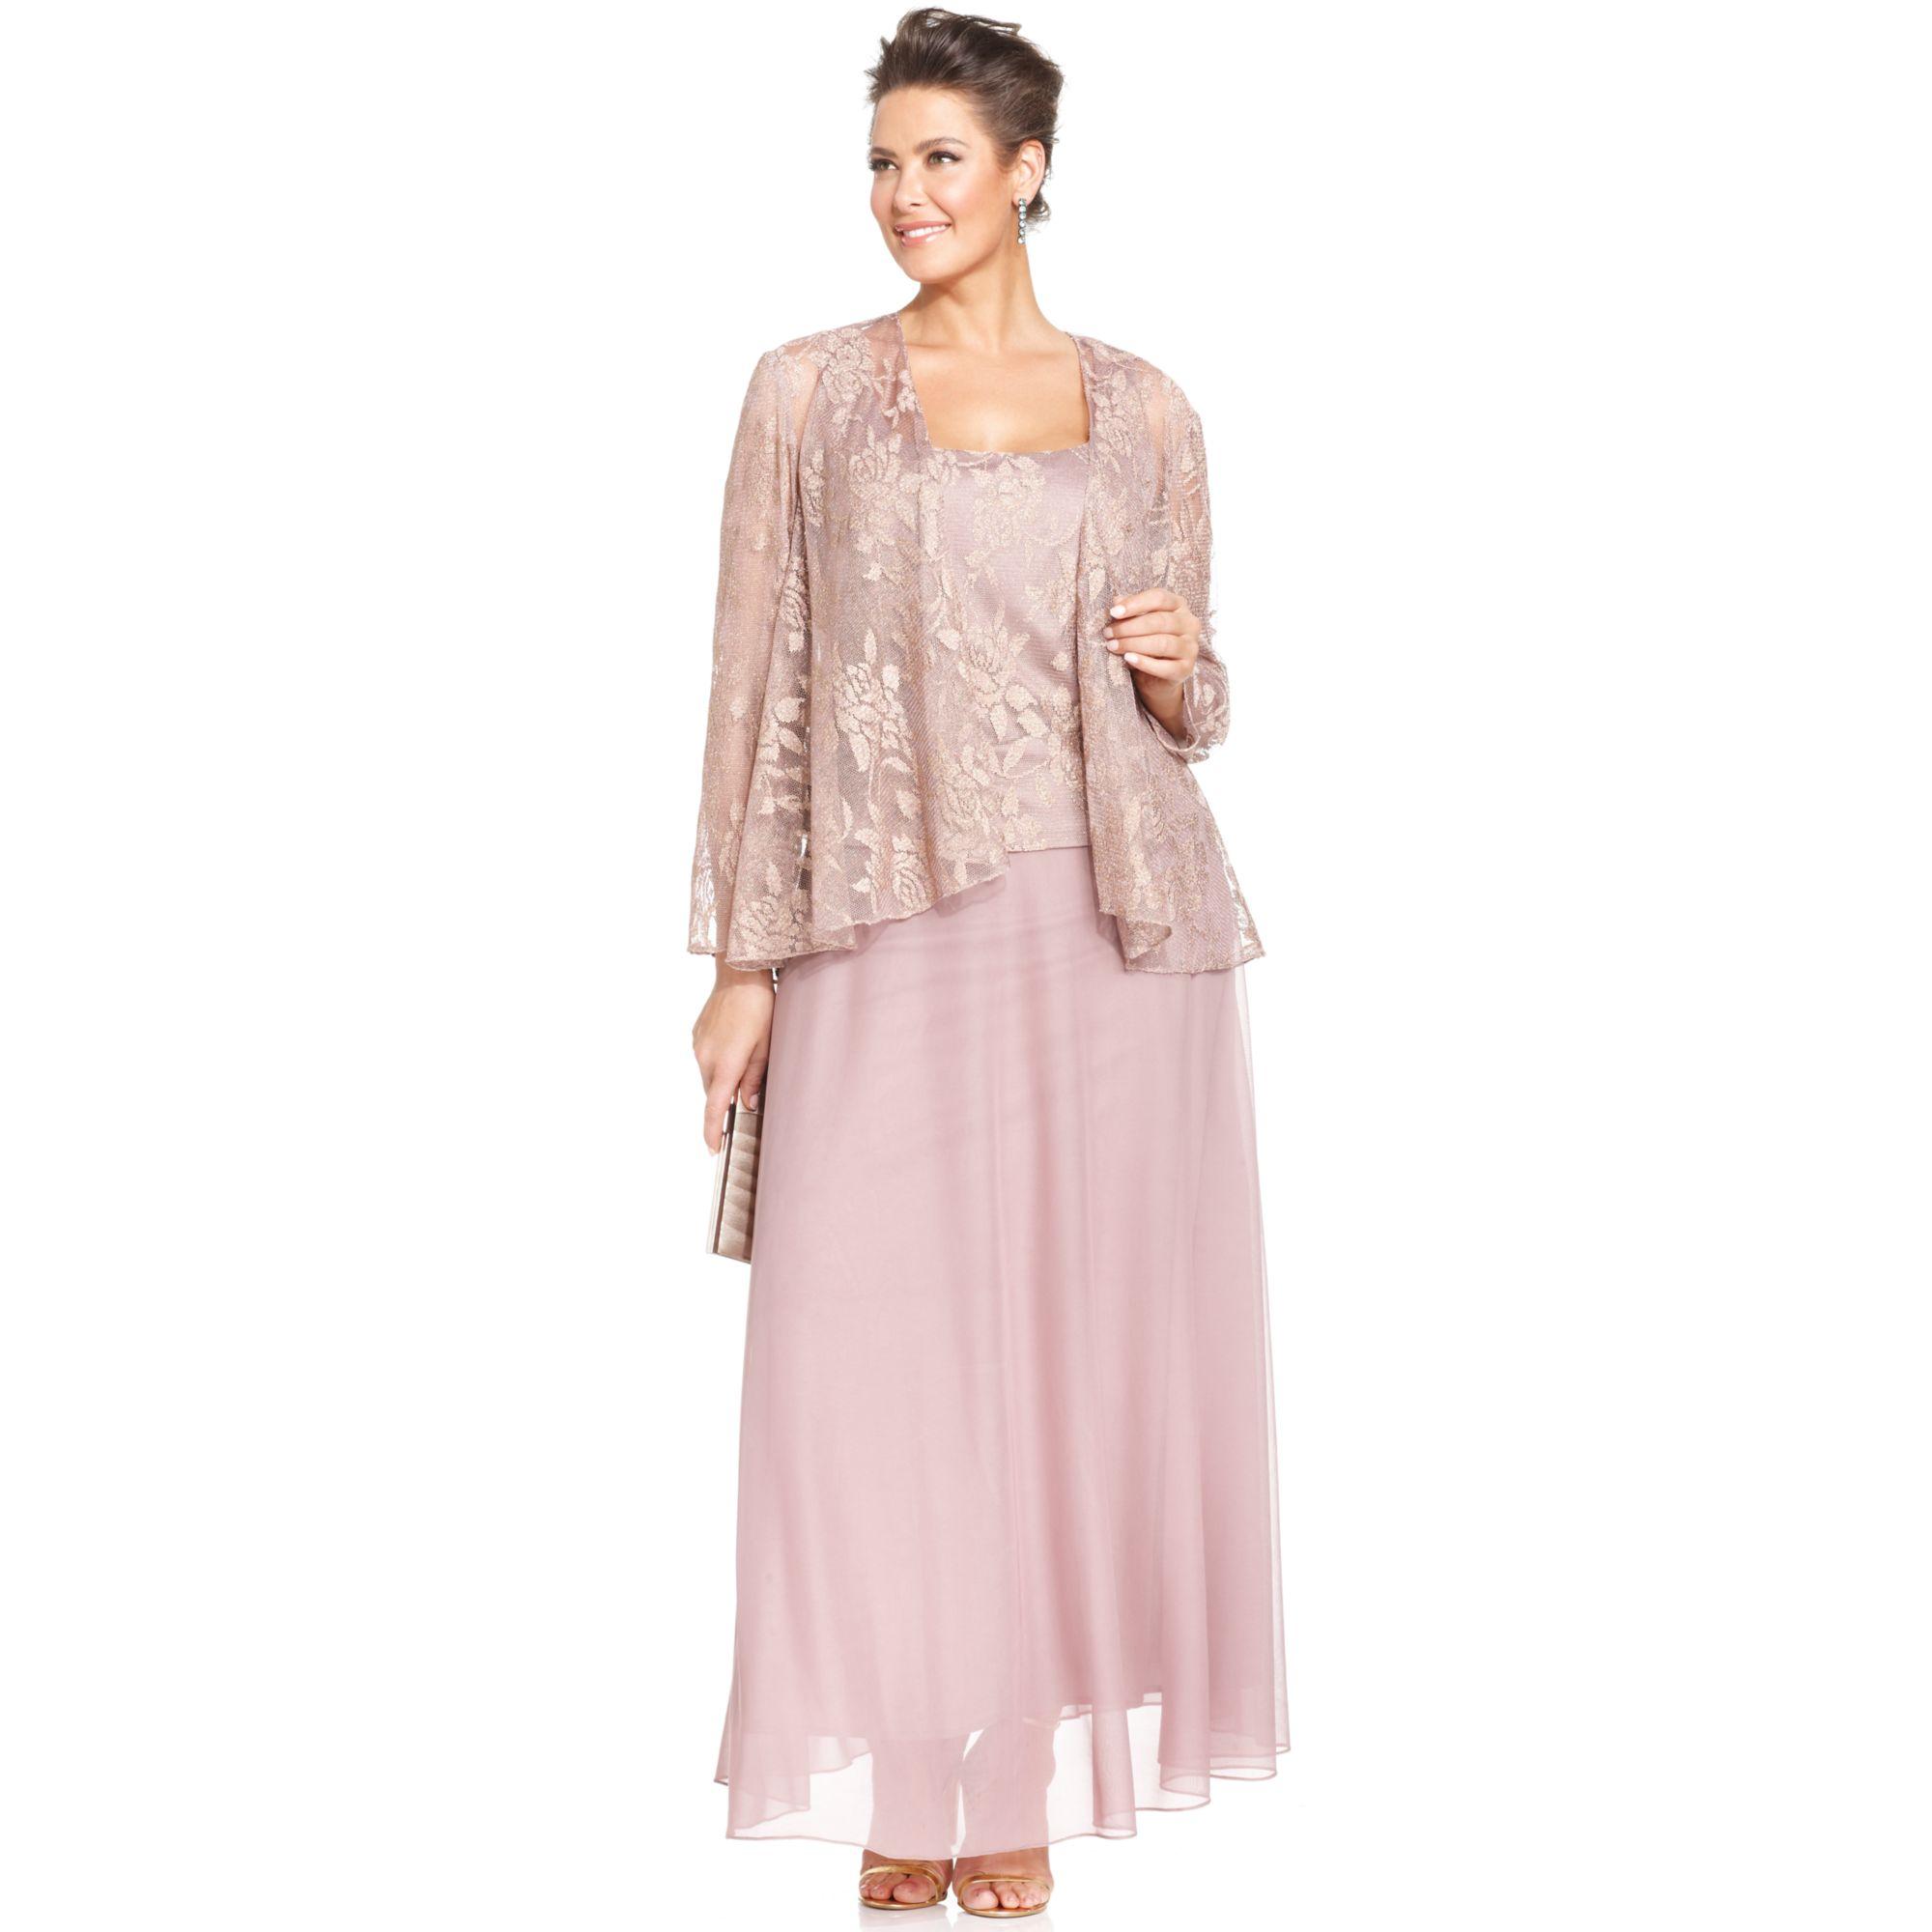 Patra Plus Size Metallic Lace Dress and Jacket in Metallic | Lyst